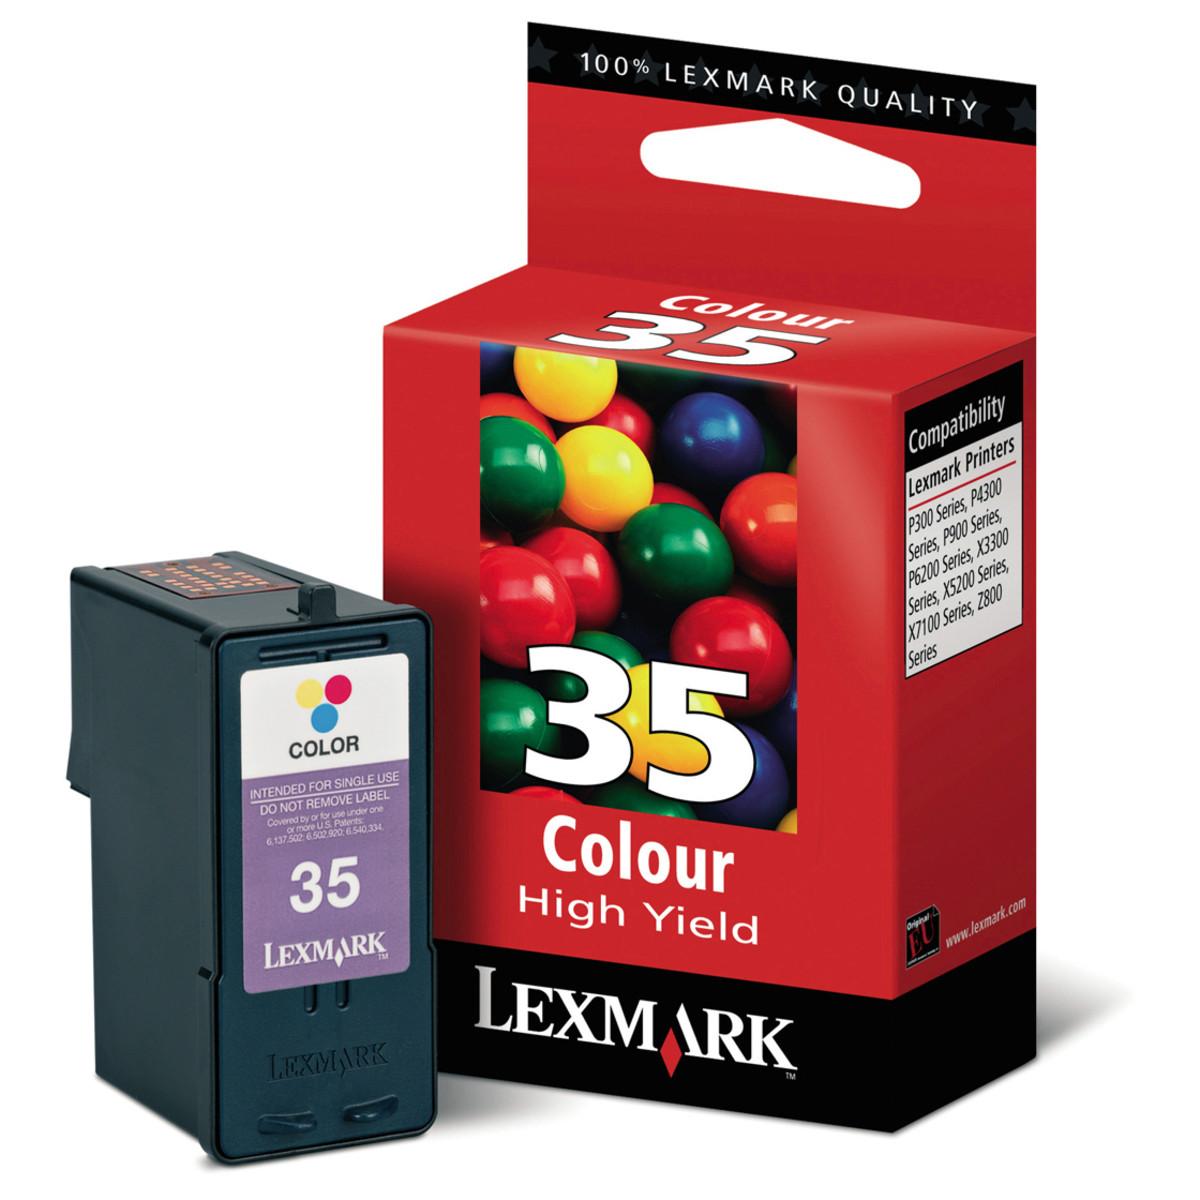 Lexmark 35 Colour Ink Cartridge